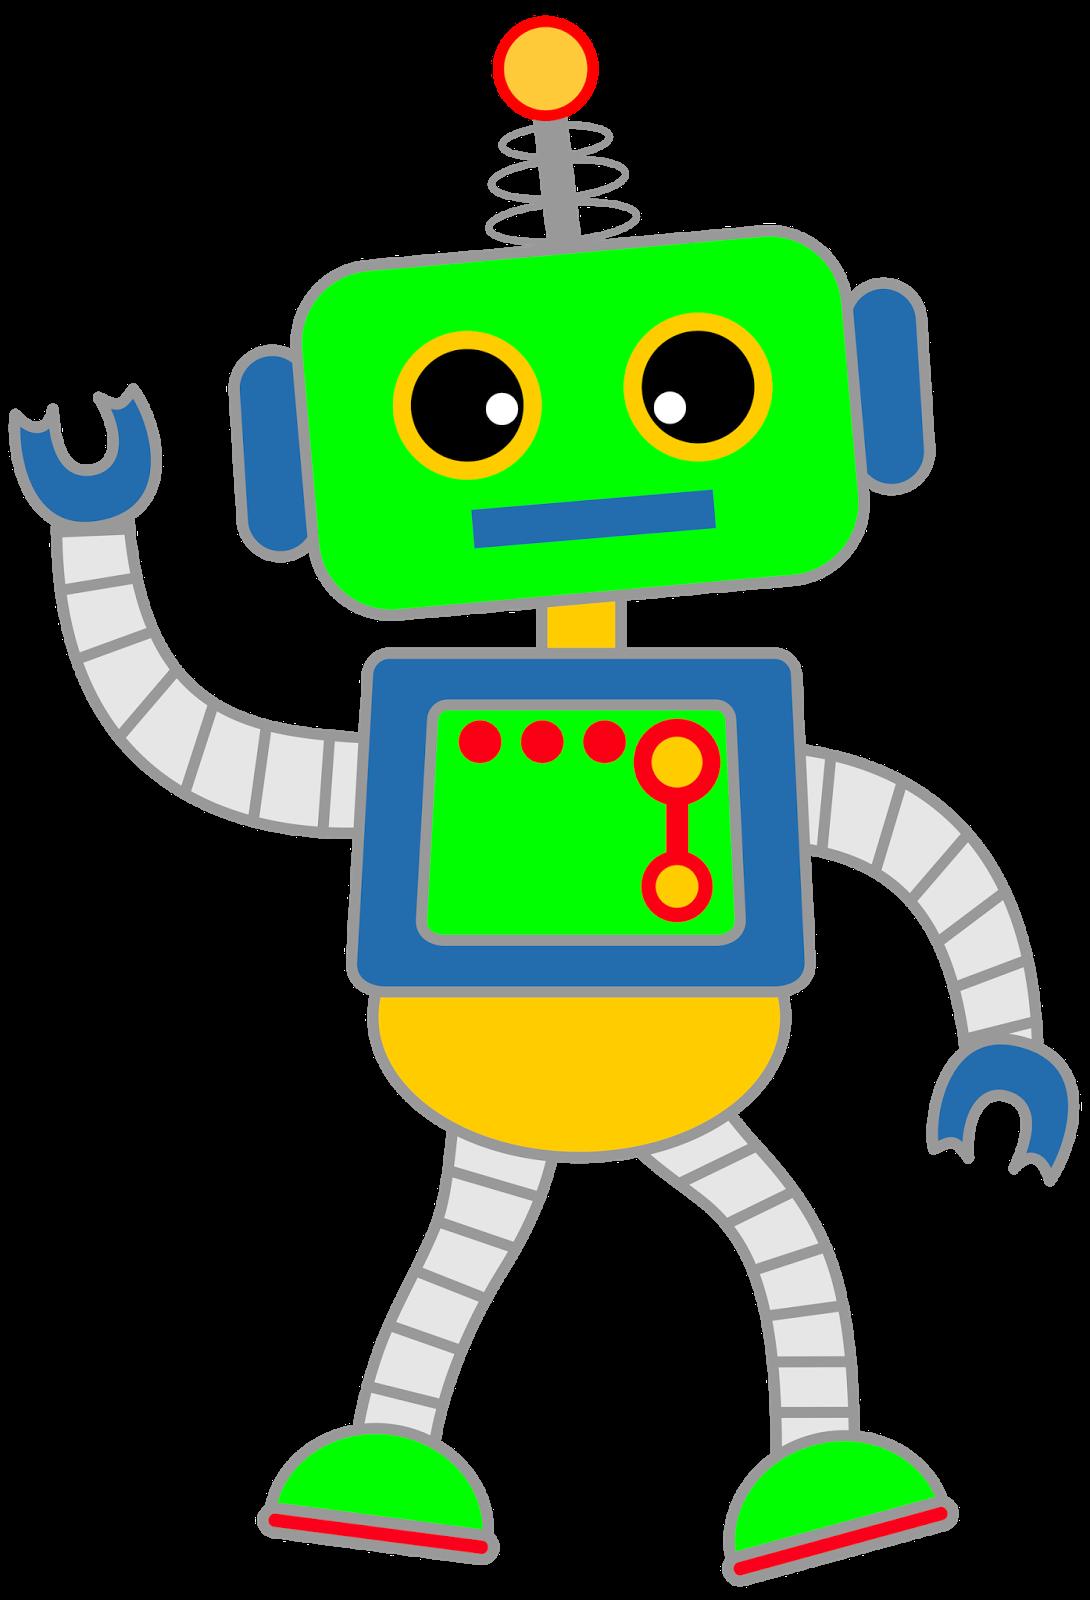 Clipart Robot - Cliparts.co